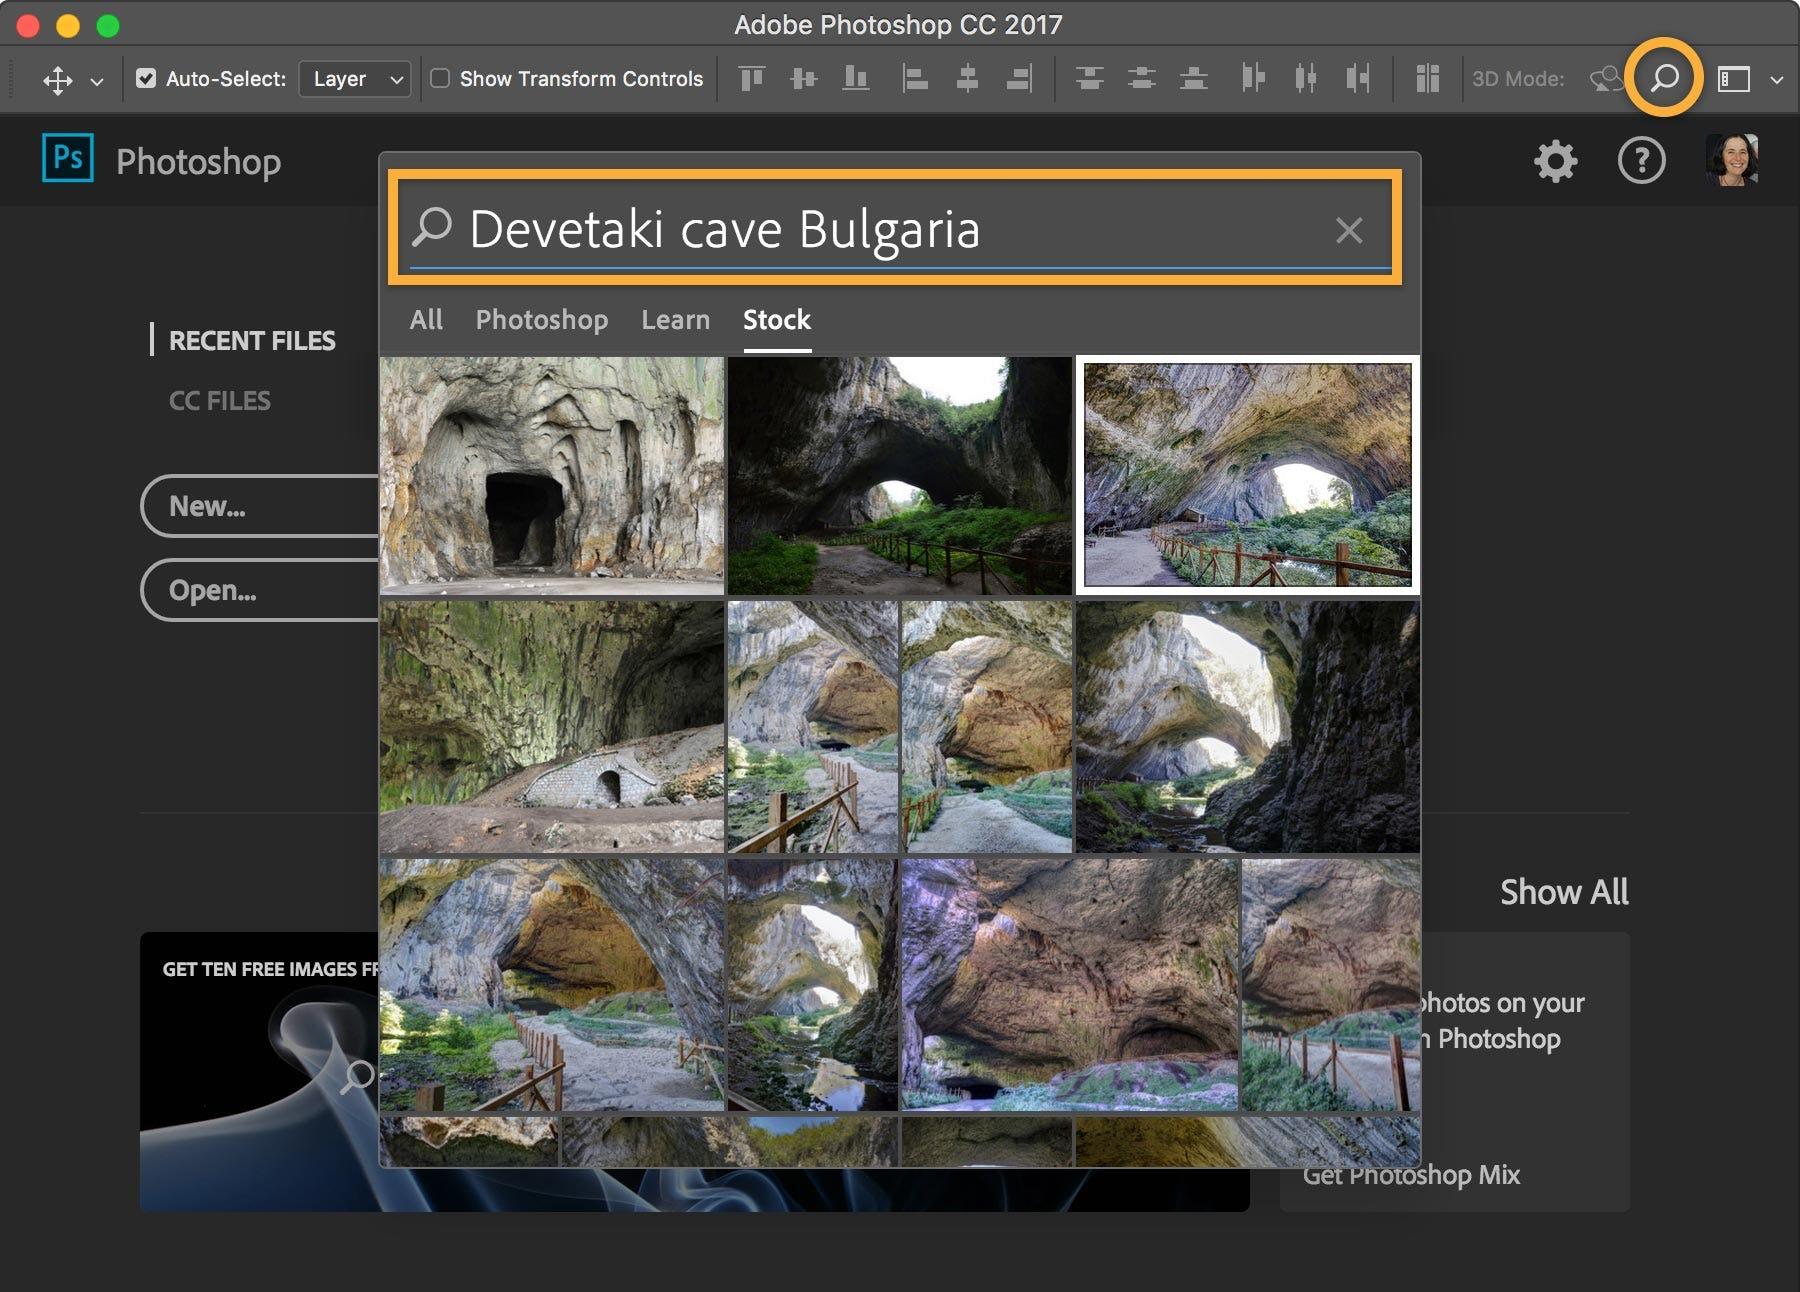 Adobe Photoshop Software - Adobe Photoshop digital stock